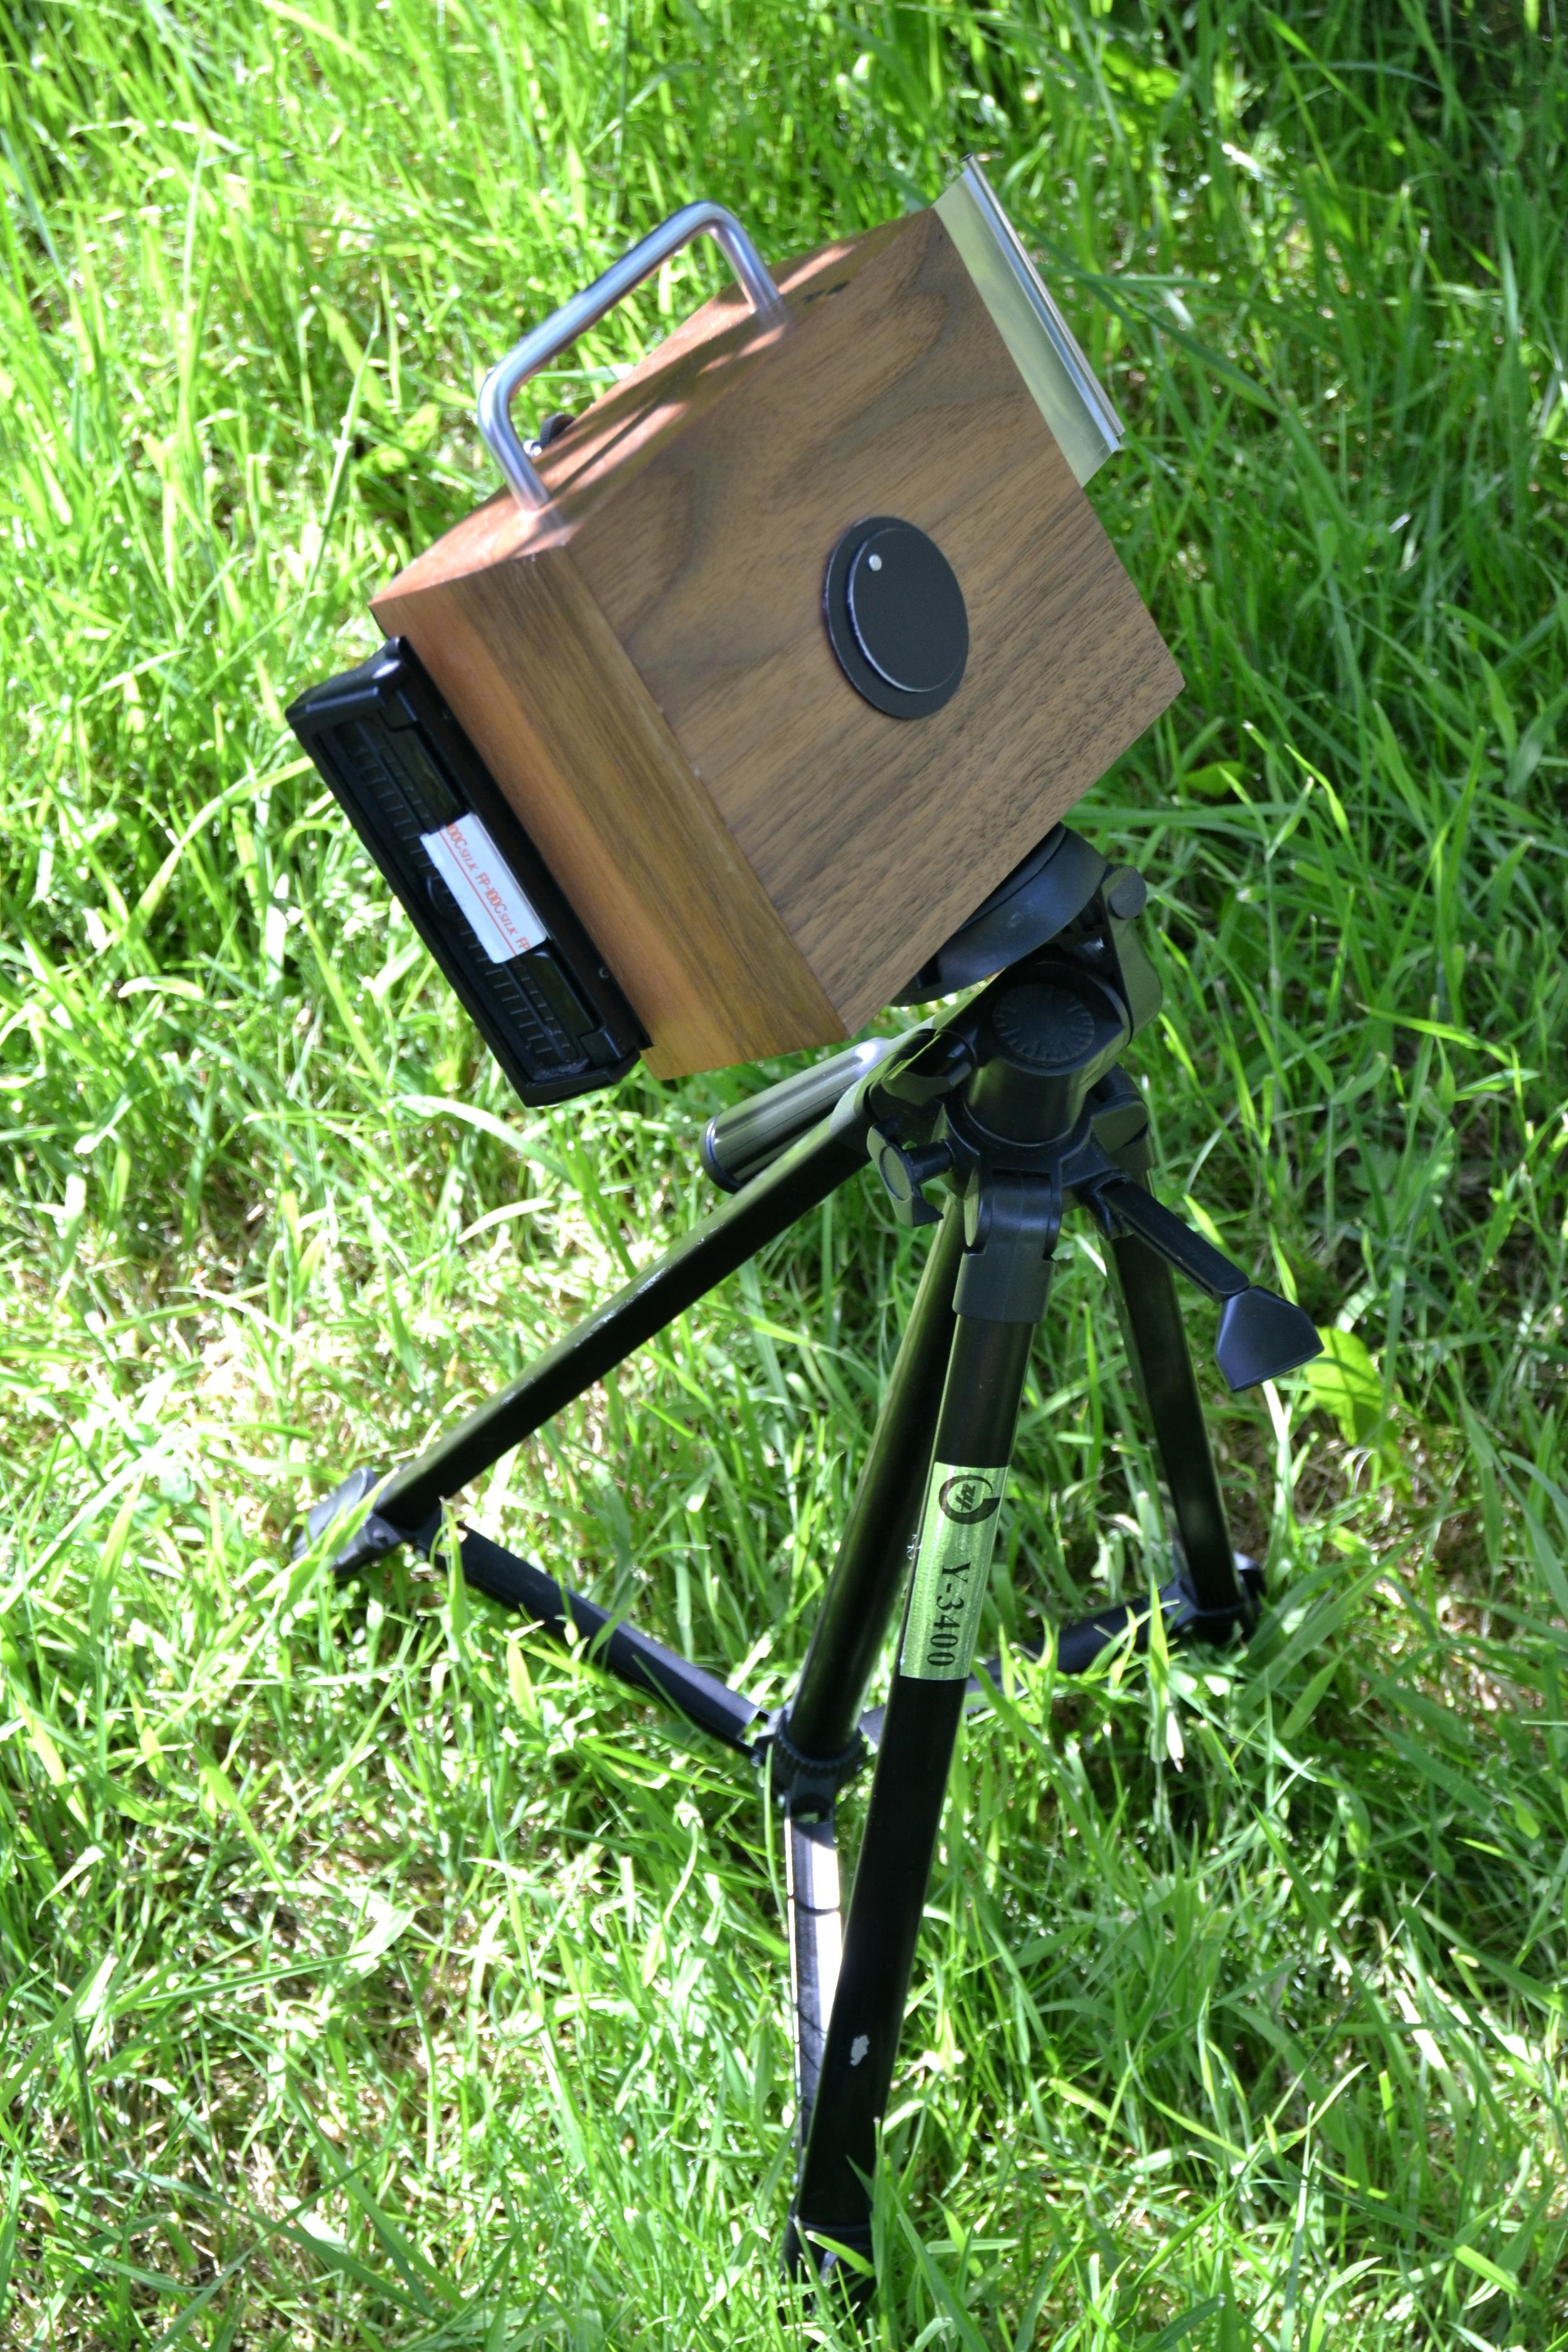 5x4 pinhole camera, polaroid back